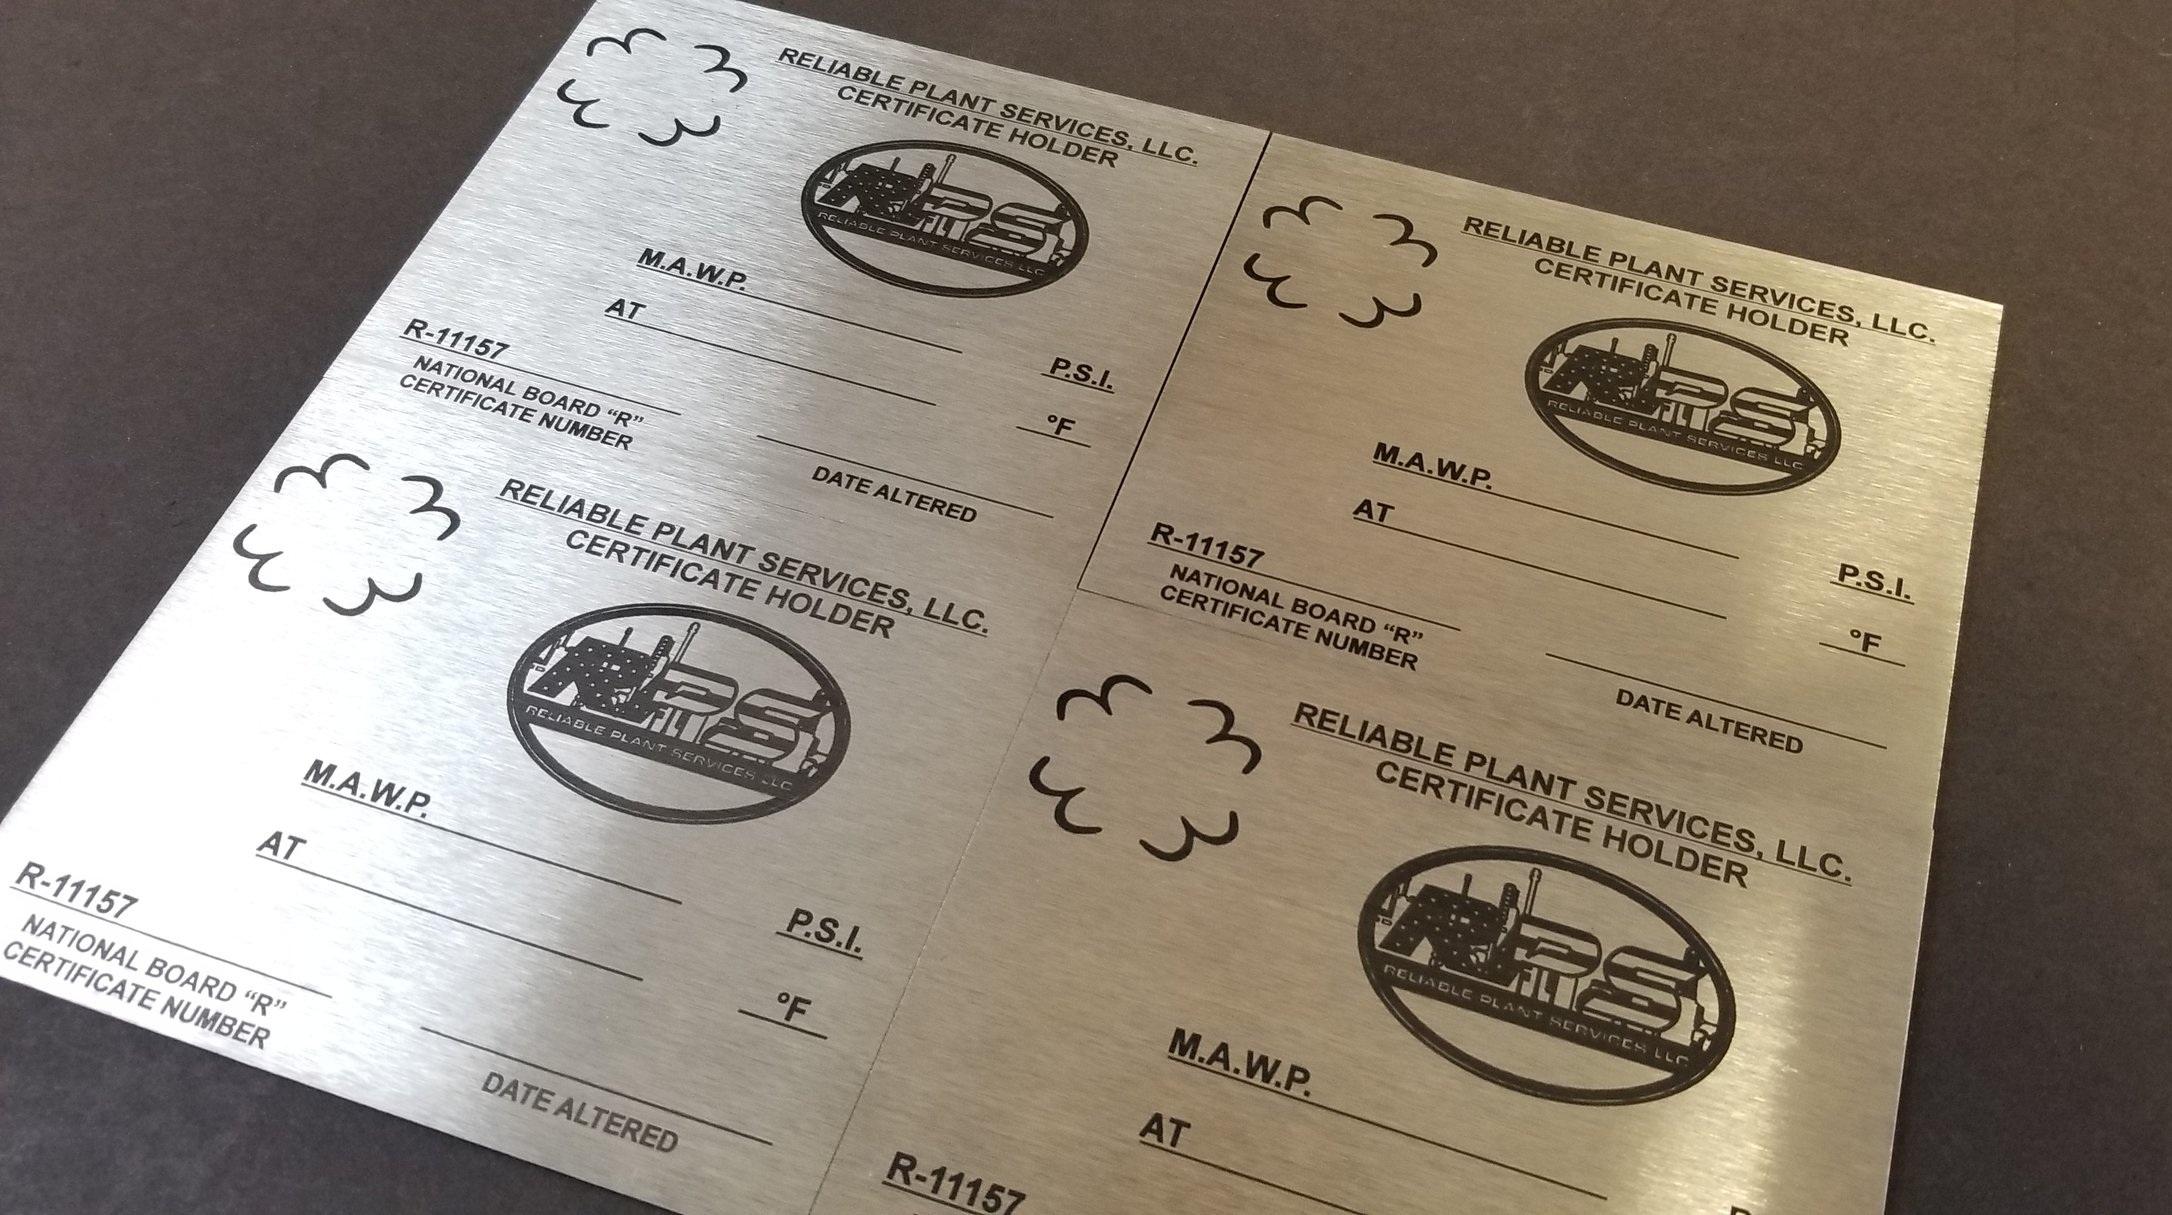 Custom Engraved Metal Plates - Stainless Steel Plates - Metal Tags - Engraved Metal Tags - Industrial Engraving - Engrave It Houston